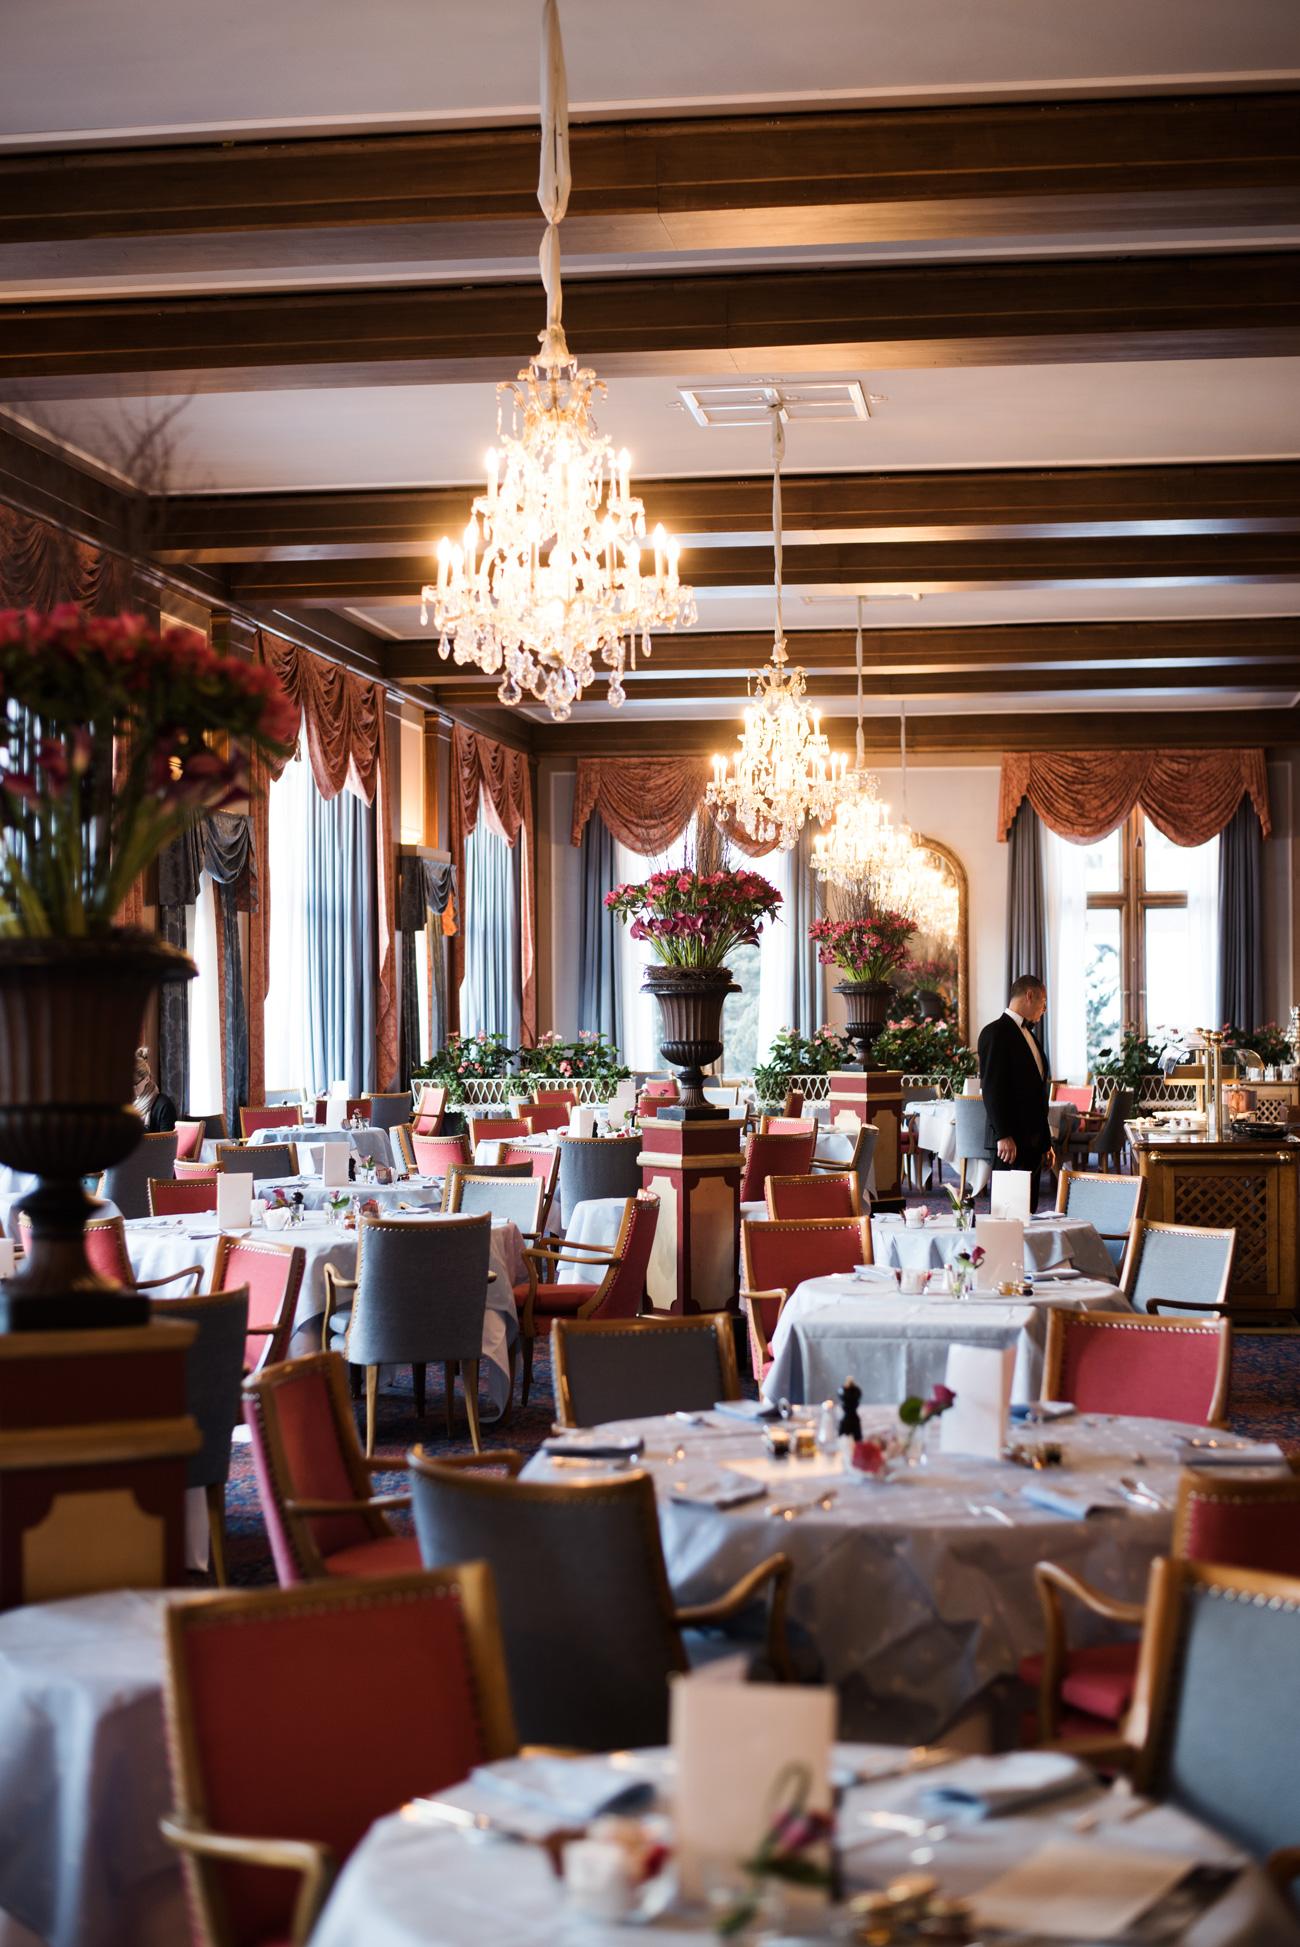 st-moritz-Badrutt's-Palace-travel-blogger-hotel-review-reise-bericht-fashiioncarpet